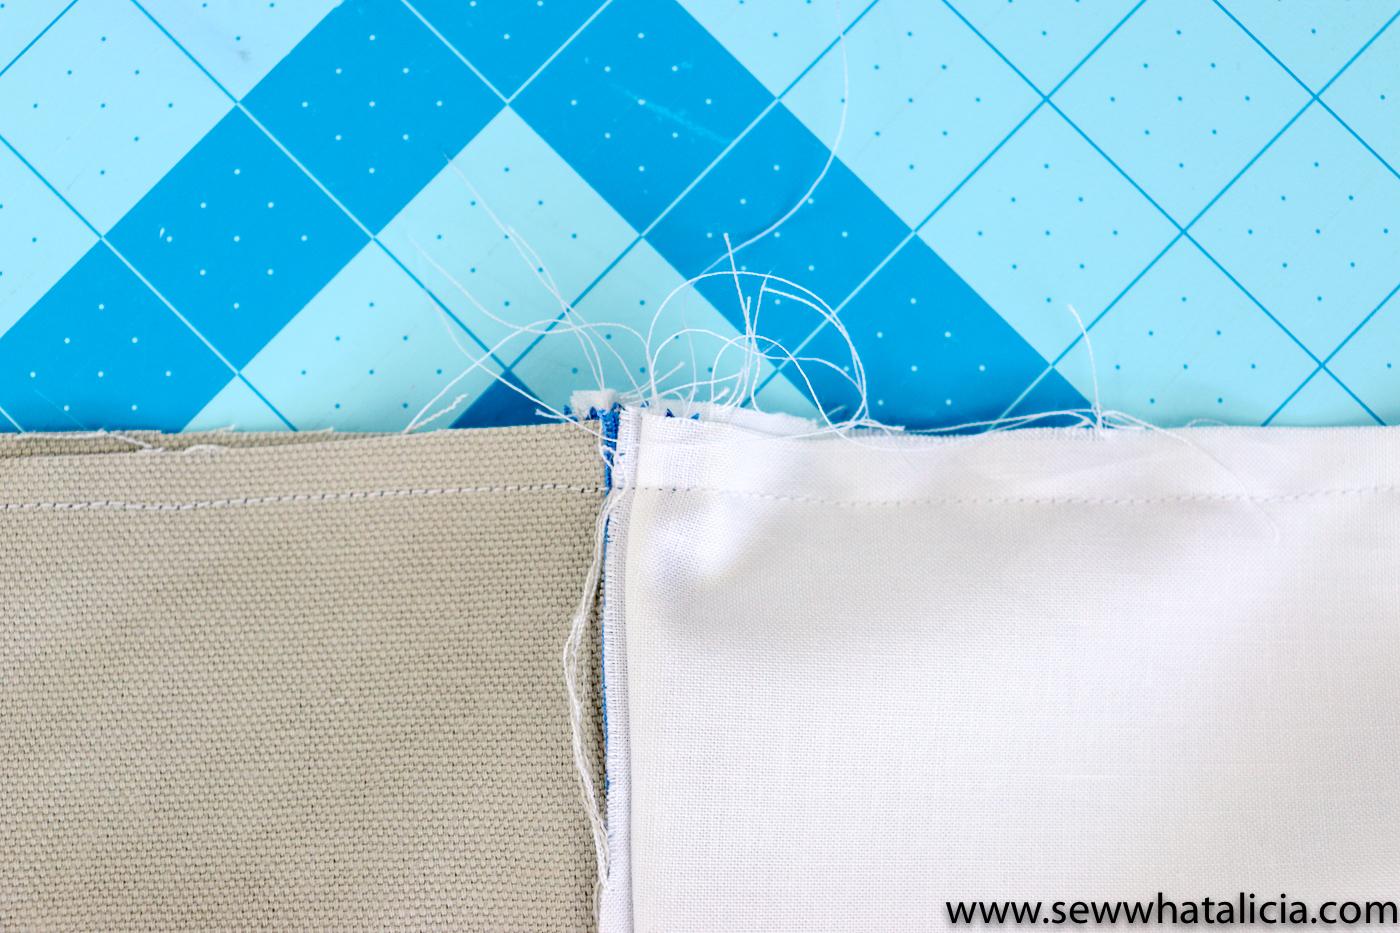 Beach Tote Bag Pattern and Free Beach Cut File - Sew What, Alicia?